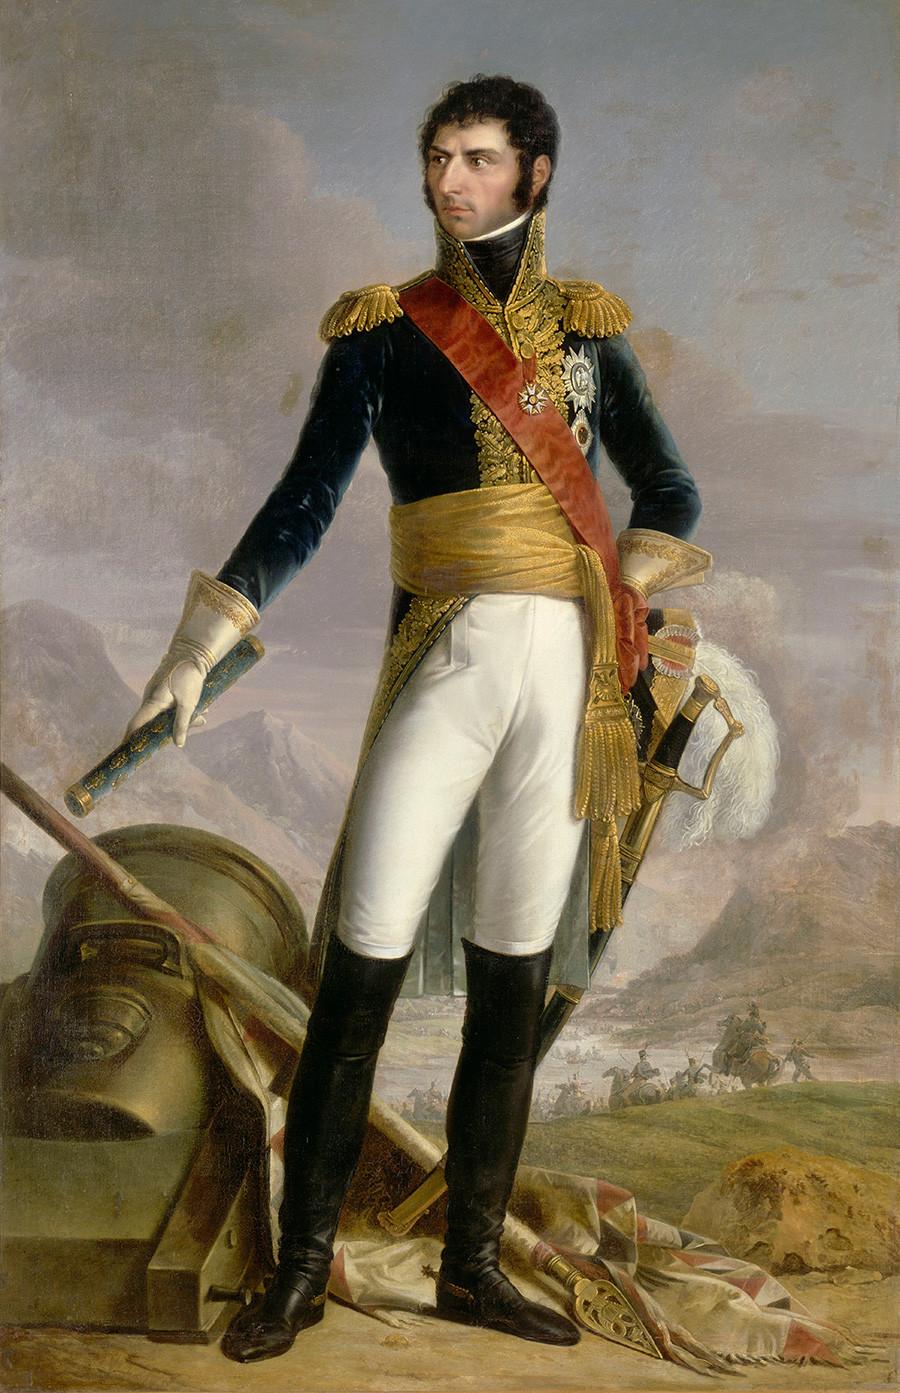 Jean-Baptiste Bernadotte Karlo XIV. Ivan Švedski i Karlo III. Ivan Norveški, maršal francuski, 1818. prema slici Francoisa Josepha Kinsona